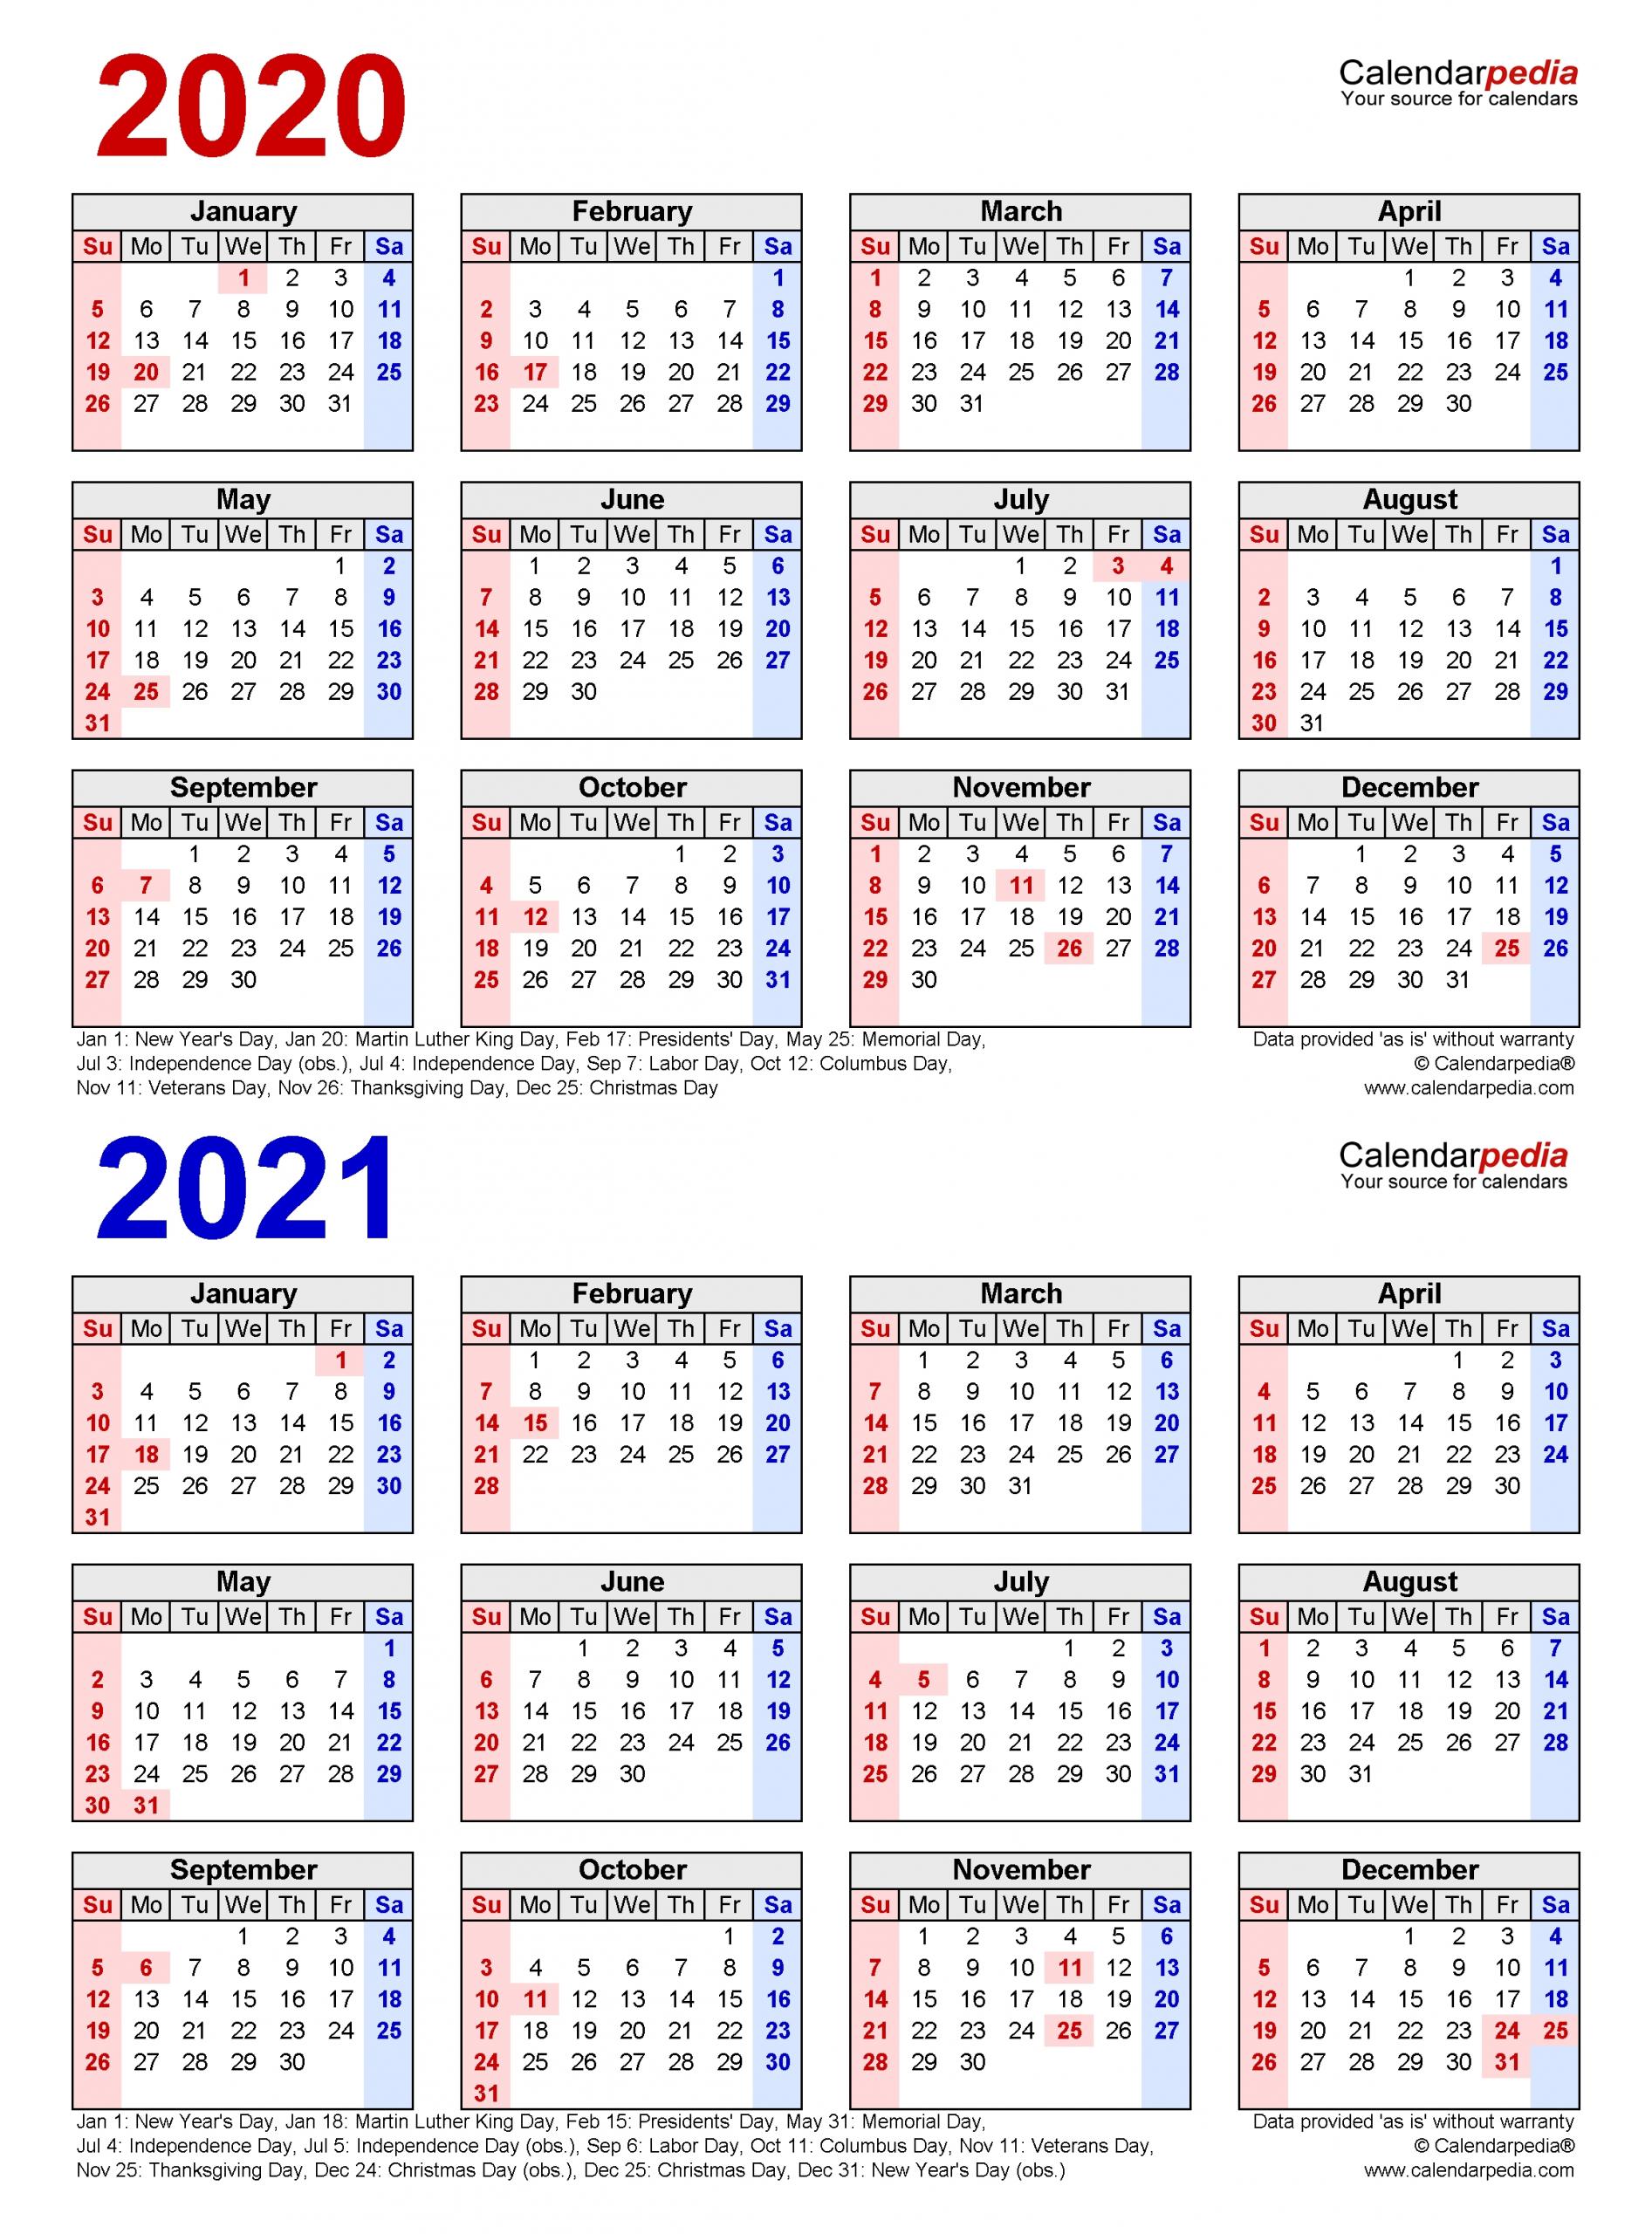 2020-2021 Two Year Calendar - Free Printable Excel Templates  Fiscal Year Au Calendar 2021/20